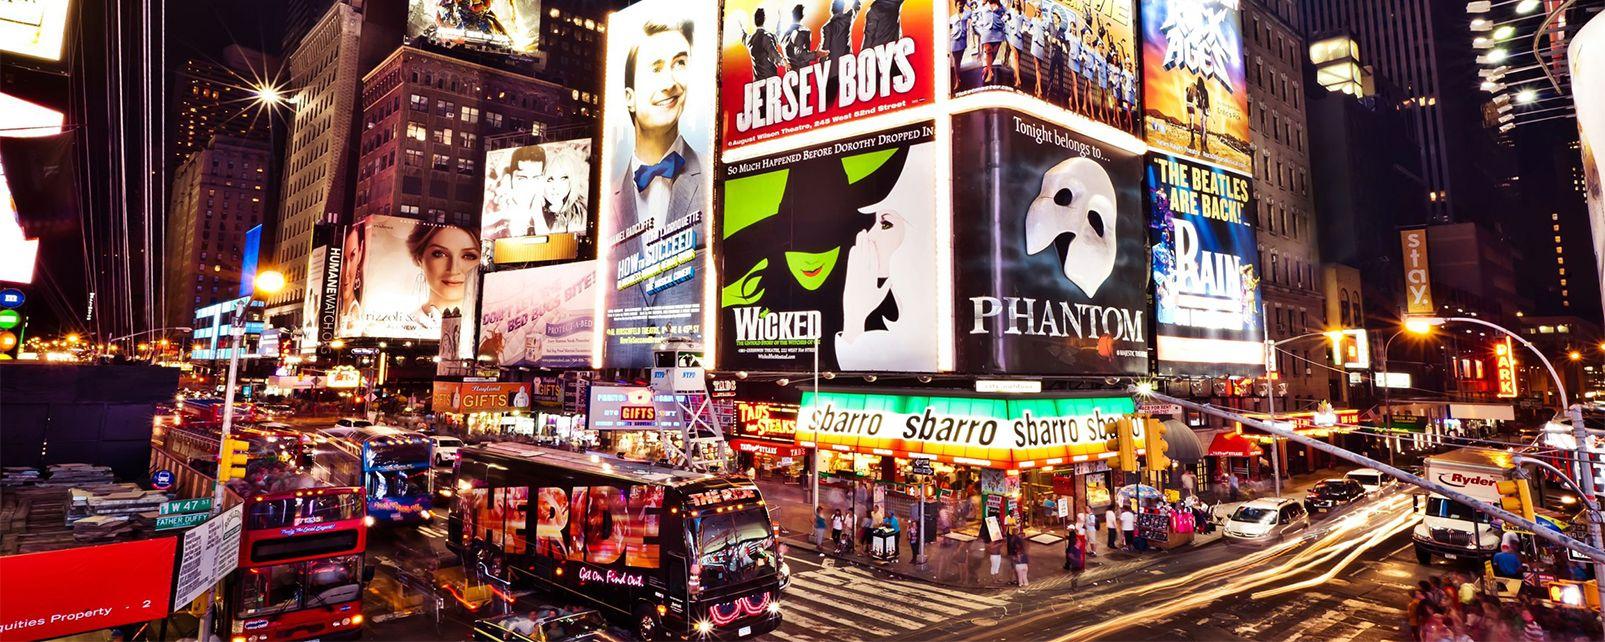 Broadway , The Phantom of the Opera , United States of America